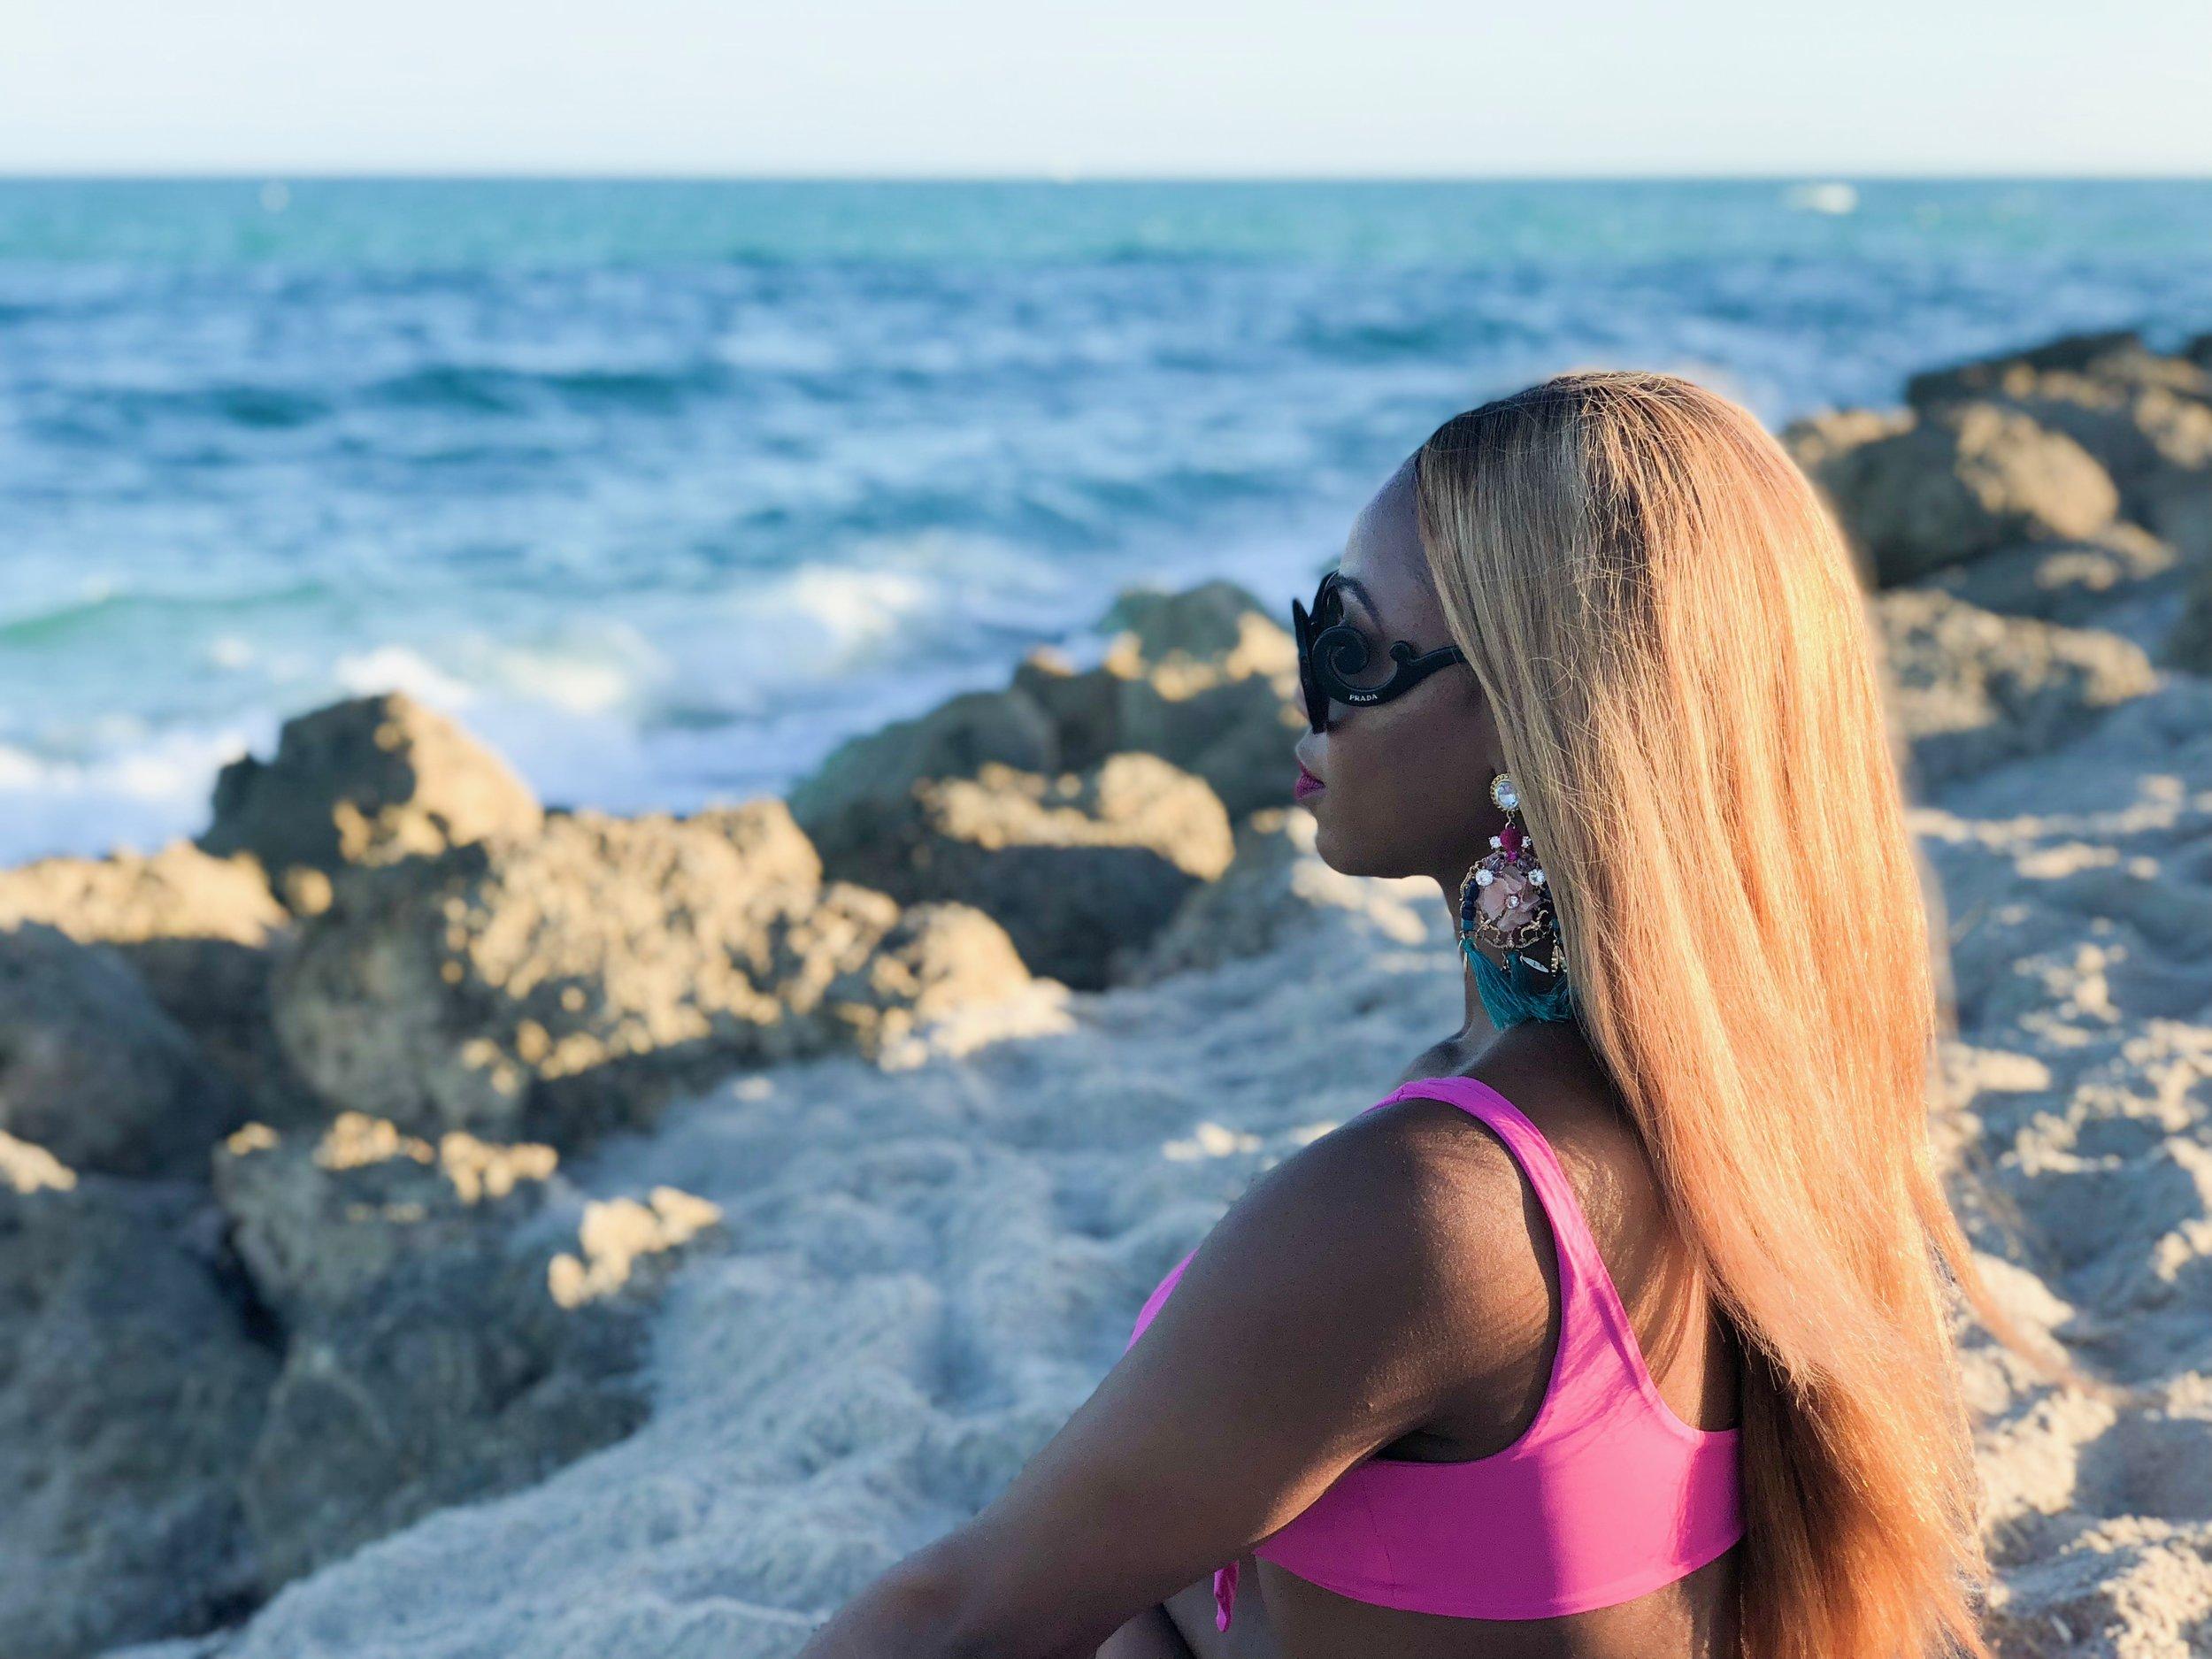 Location: Faena (beach)  Swimsuit: Amazon  Sunglasses: Prada  Earrings: Aldo accessories